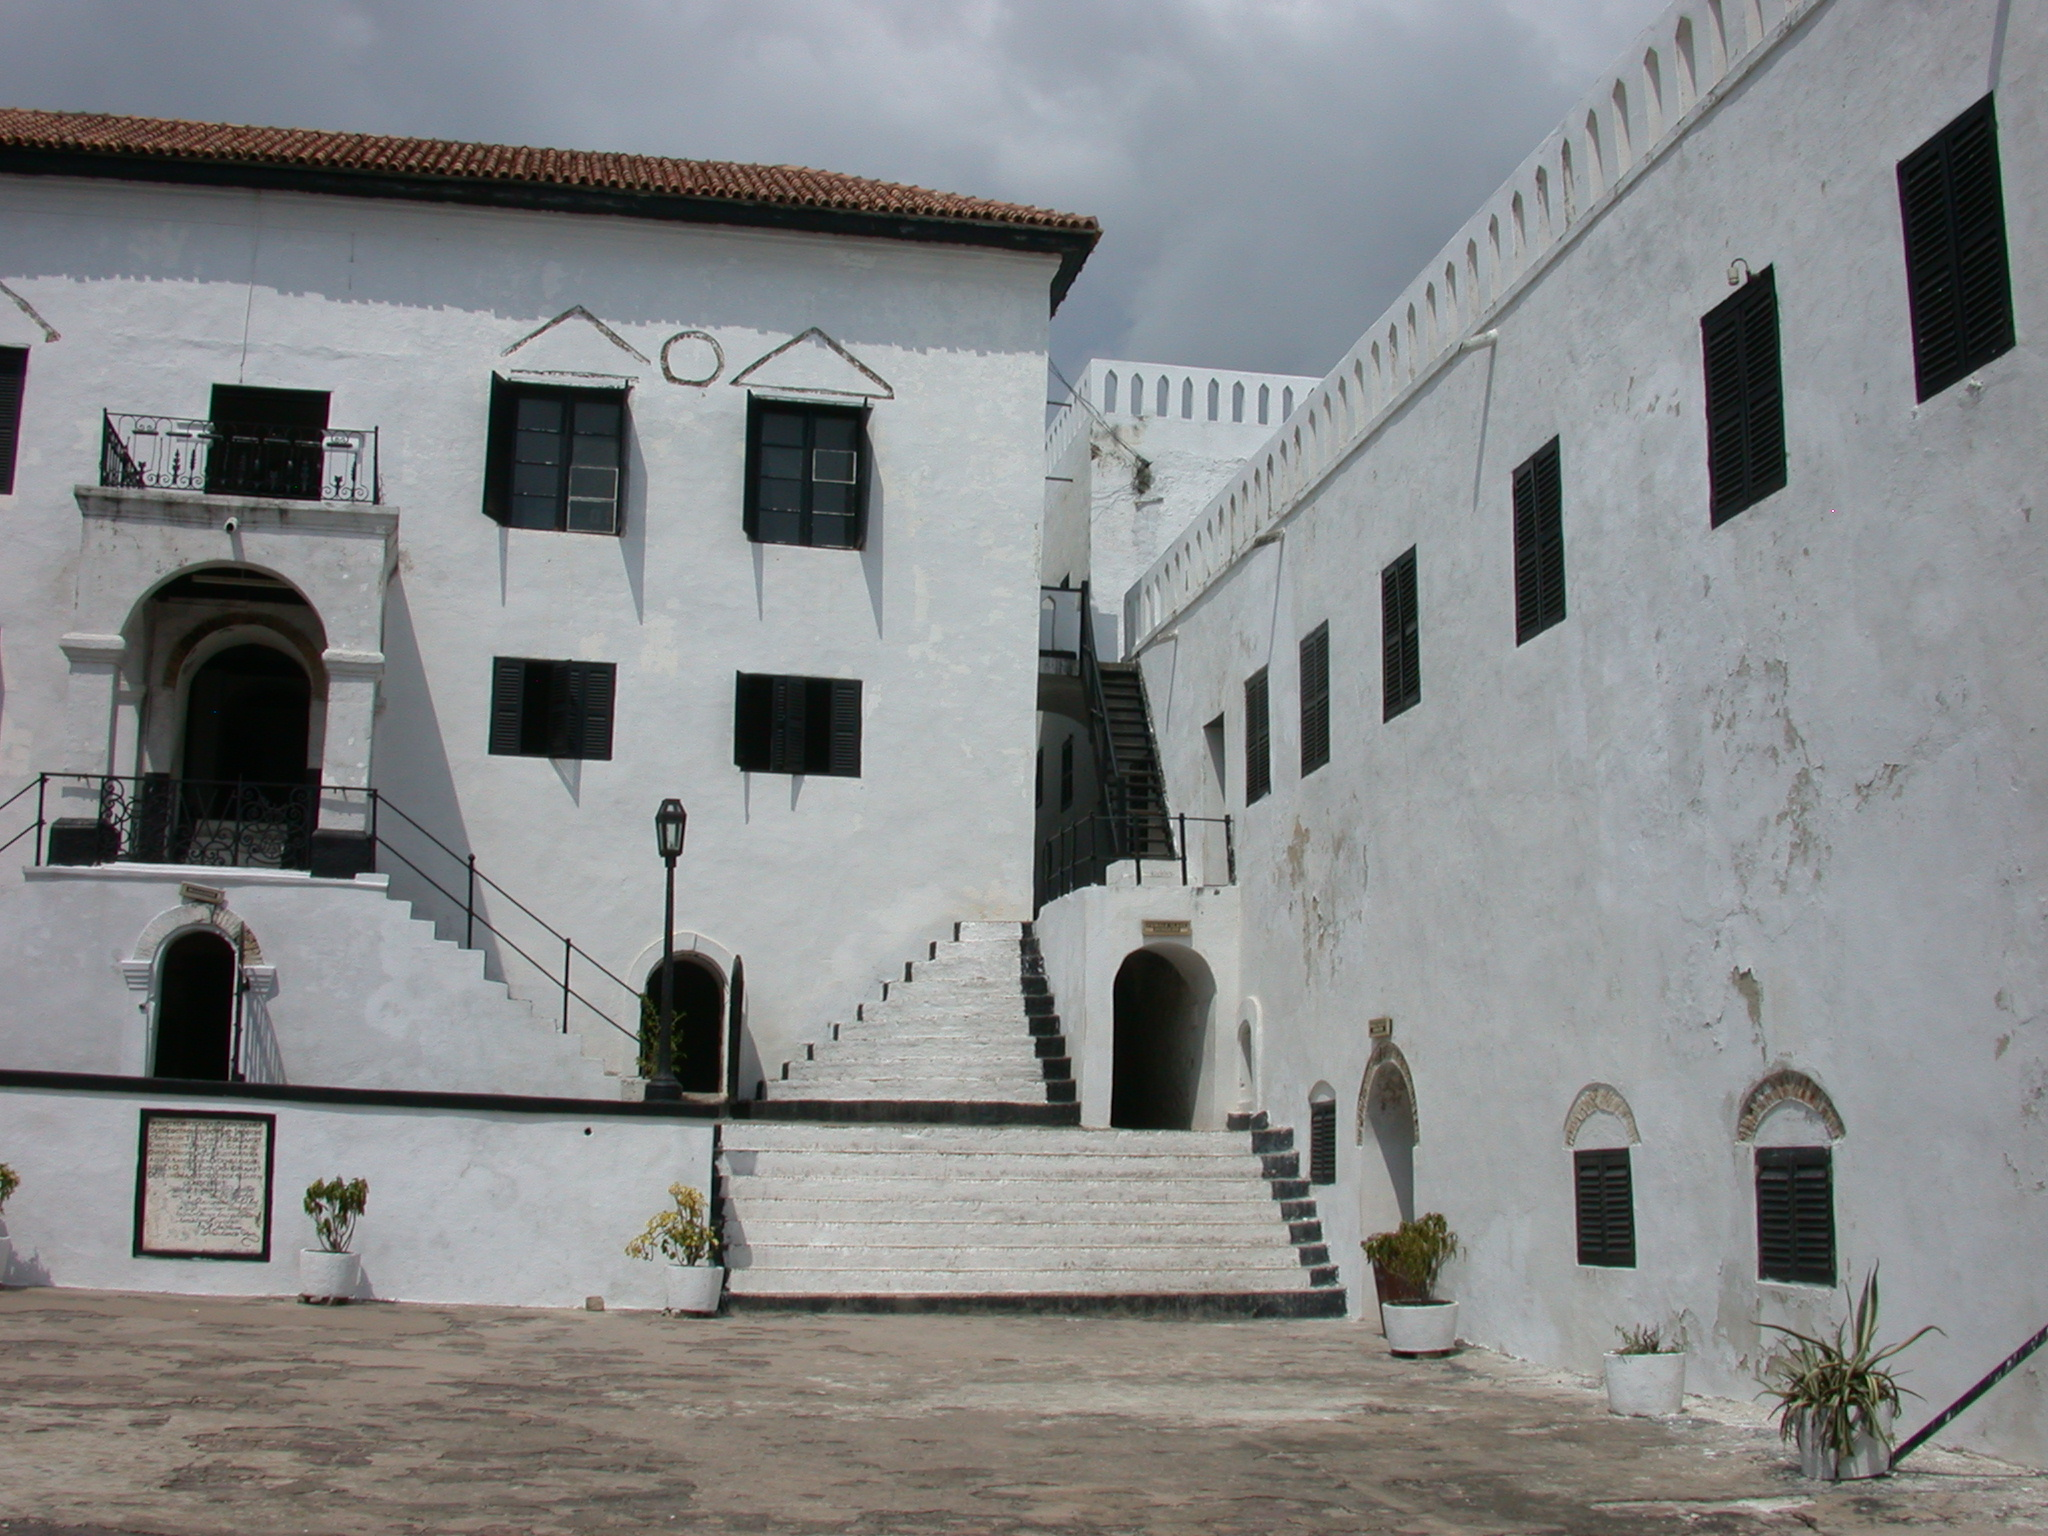 Courtyard, Elmina Slave Fort, Elmina, Ghana